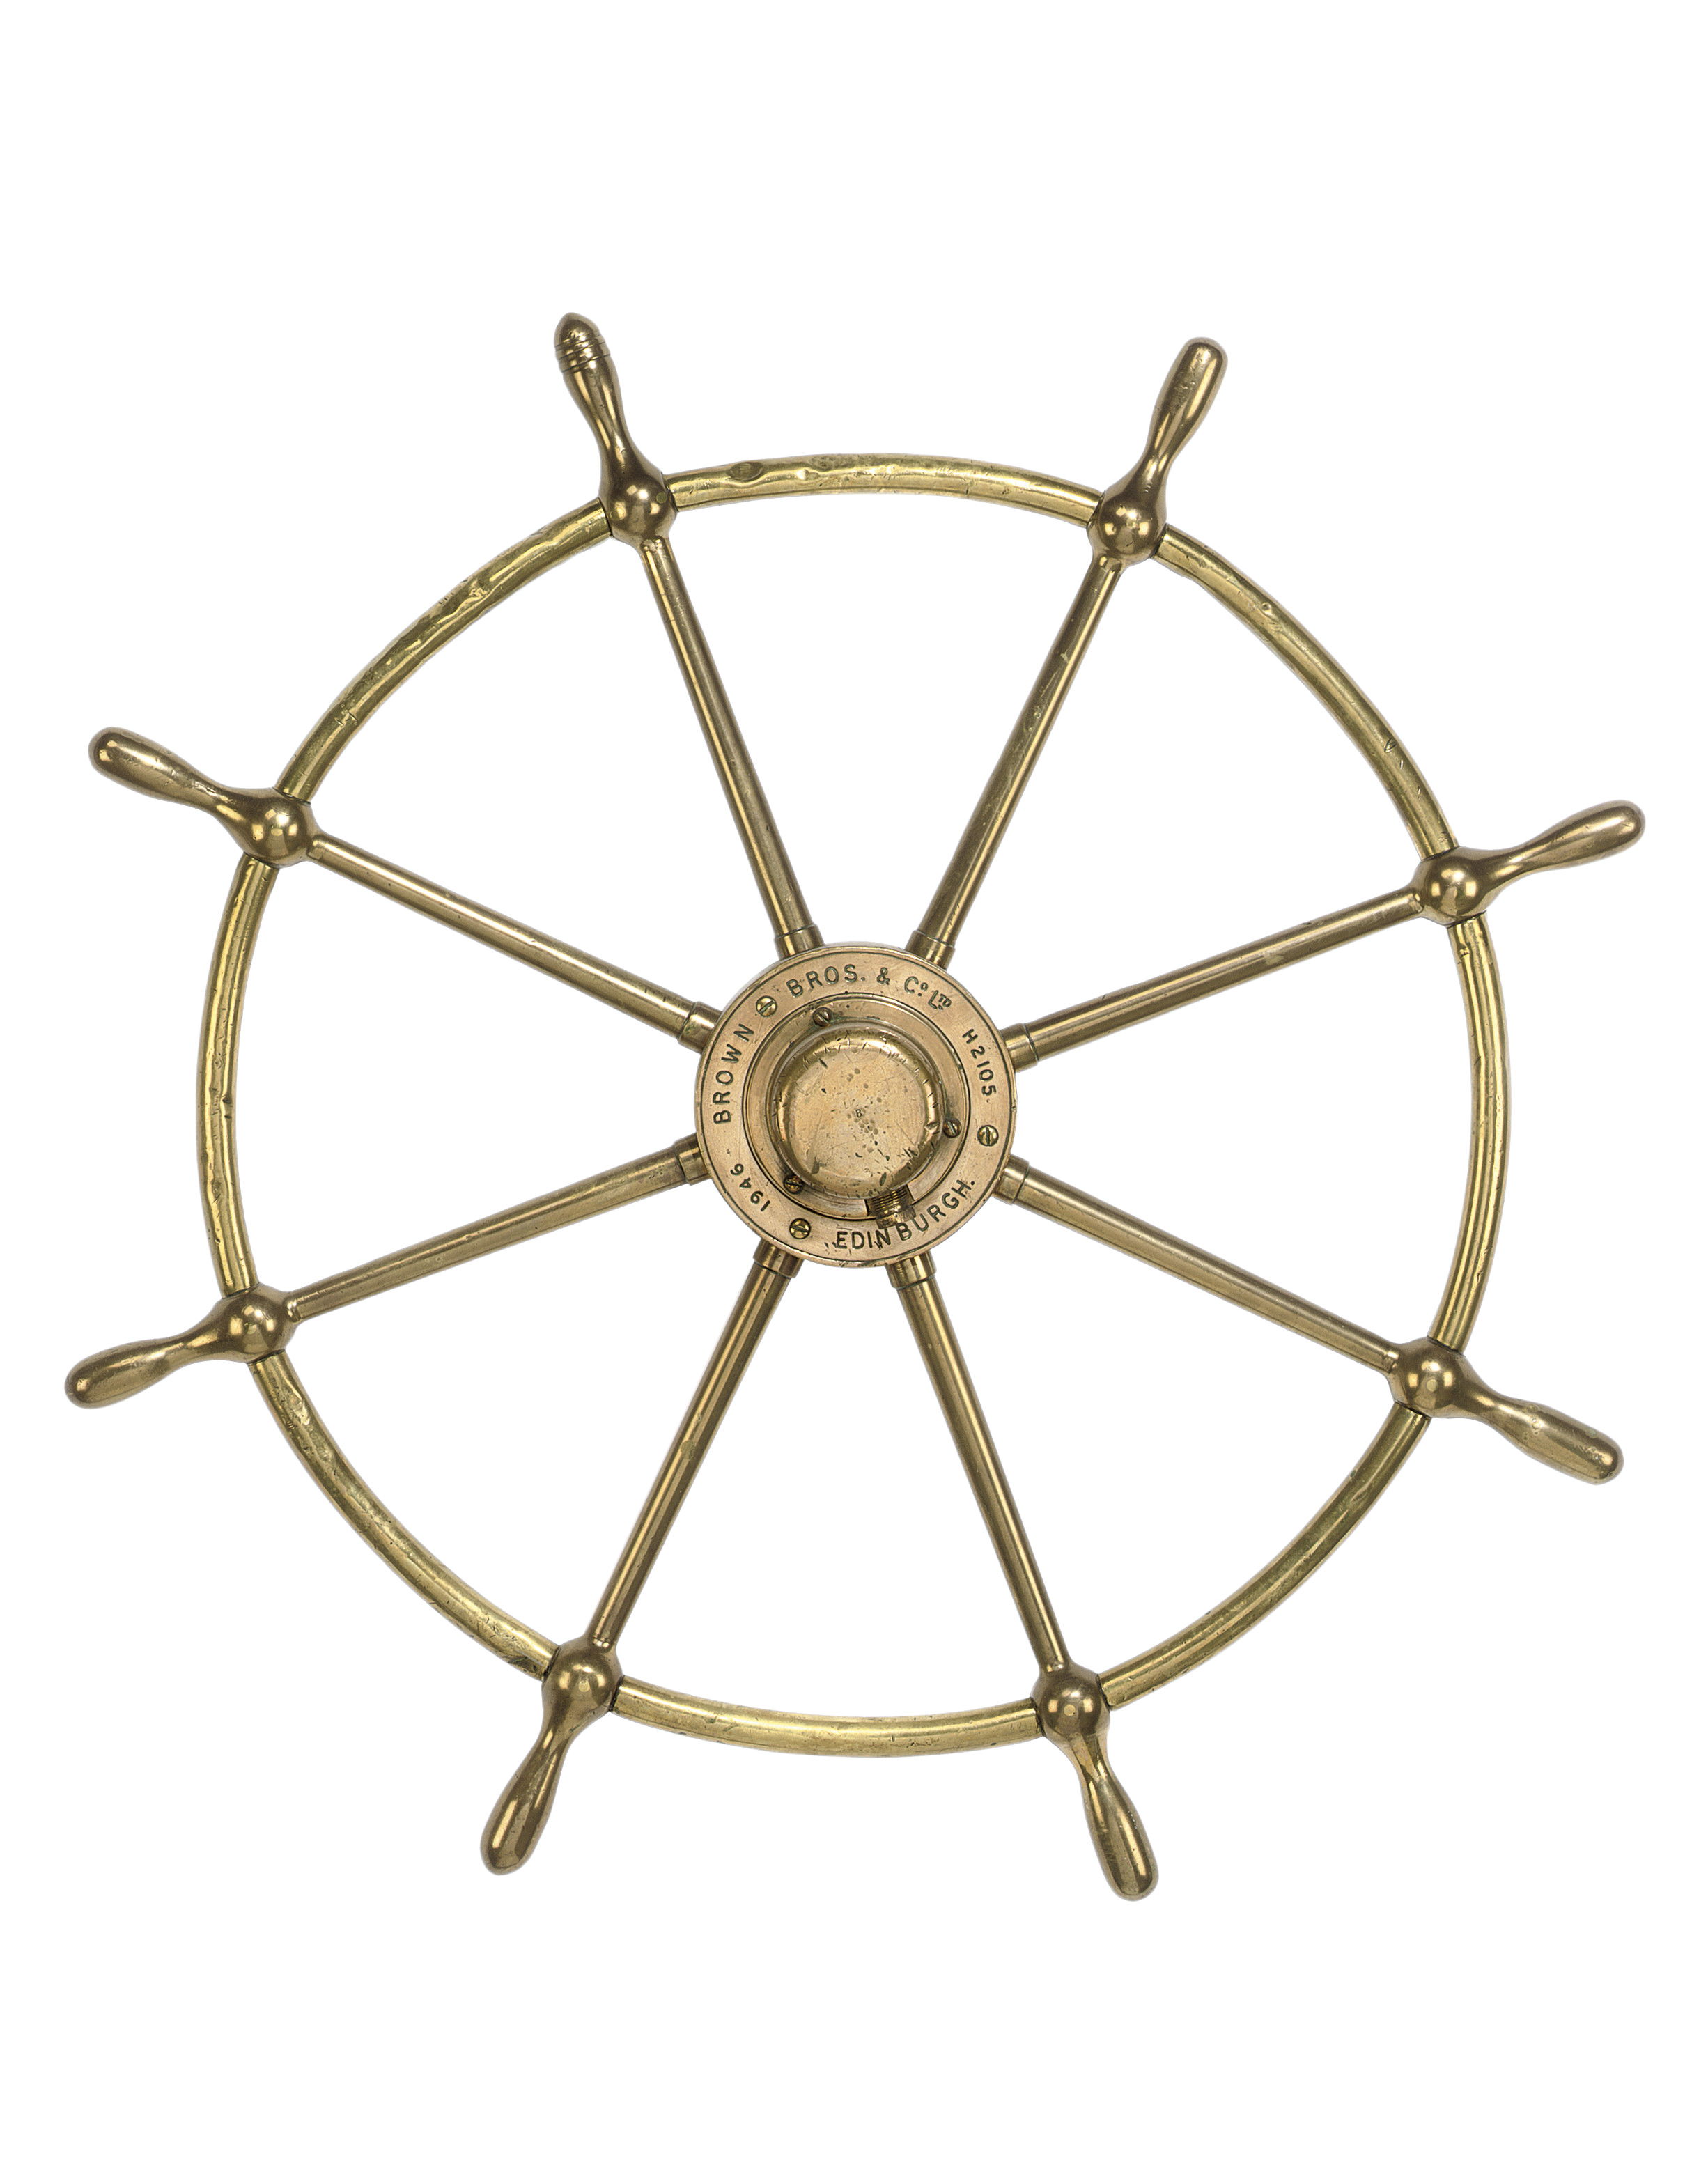 A BRASS SHIP'S WHEEL